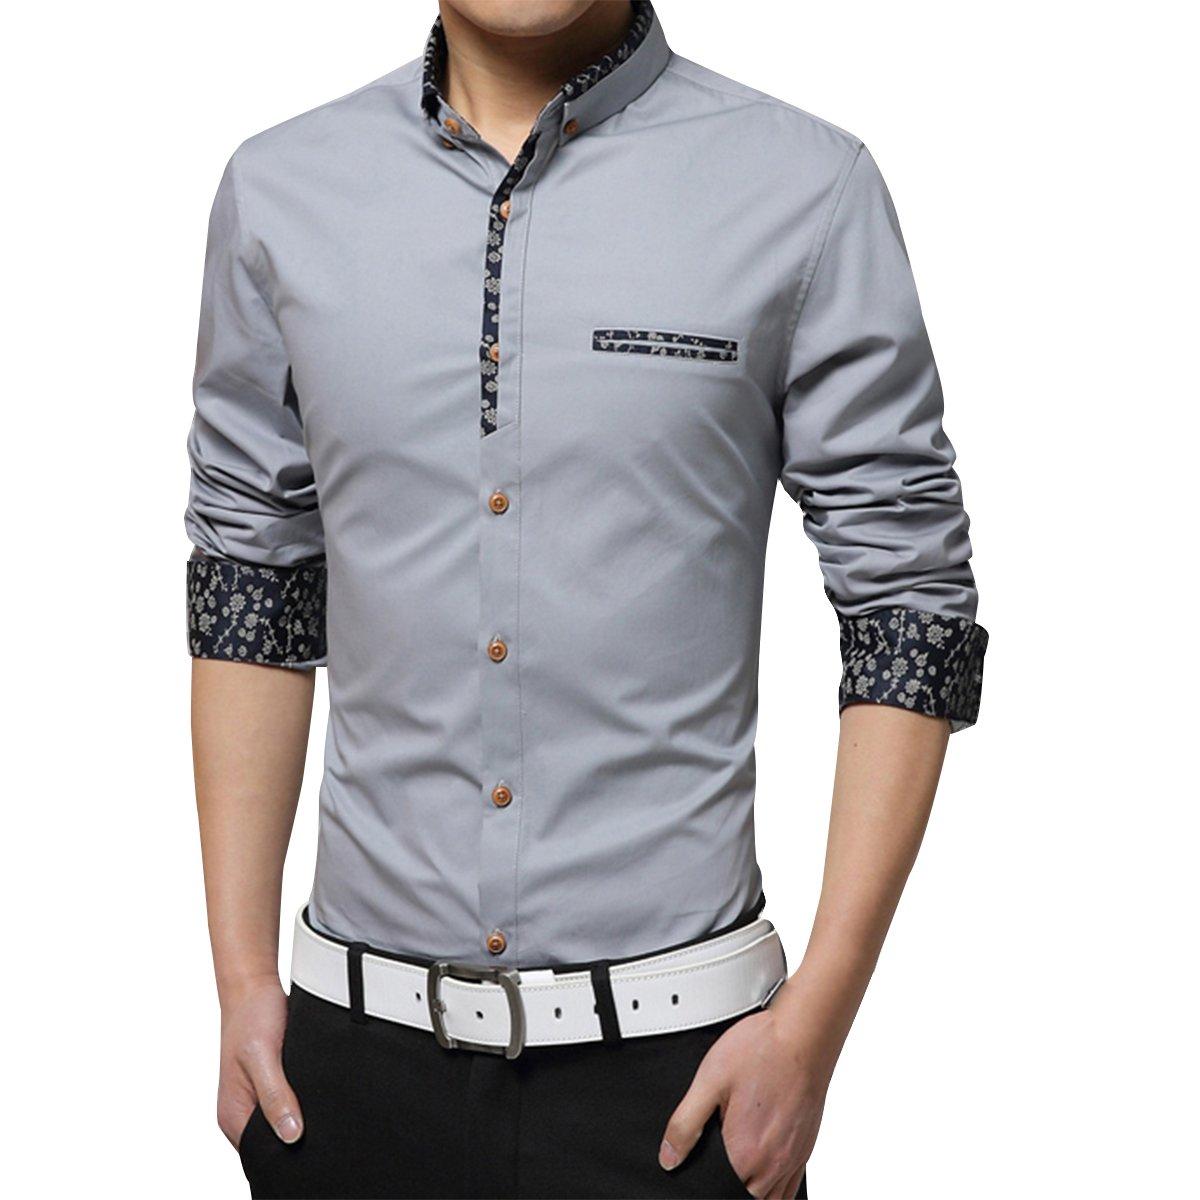 Pishon Mens Long Sleeve Shirts Wrinkle Free Contrast Collar Button Down Shirts